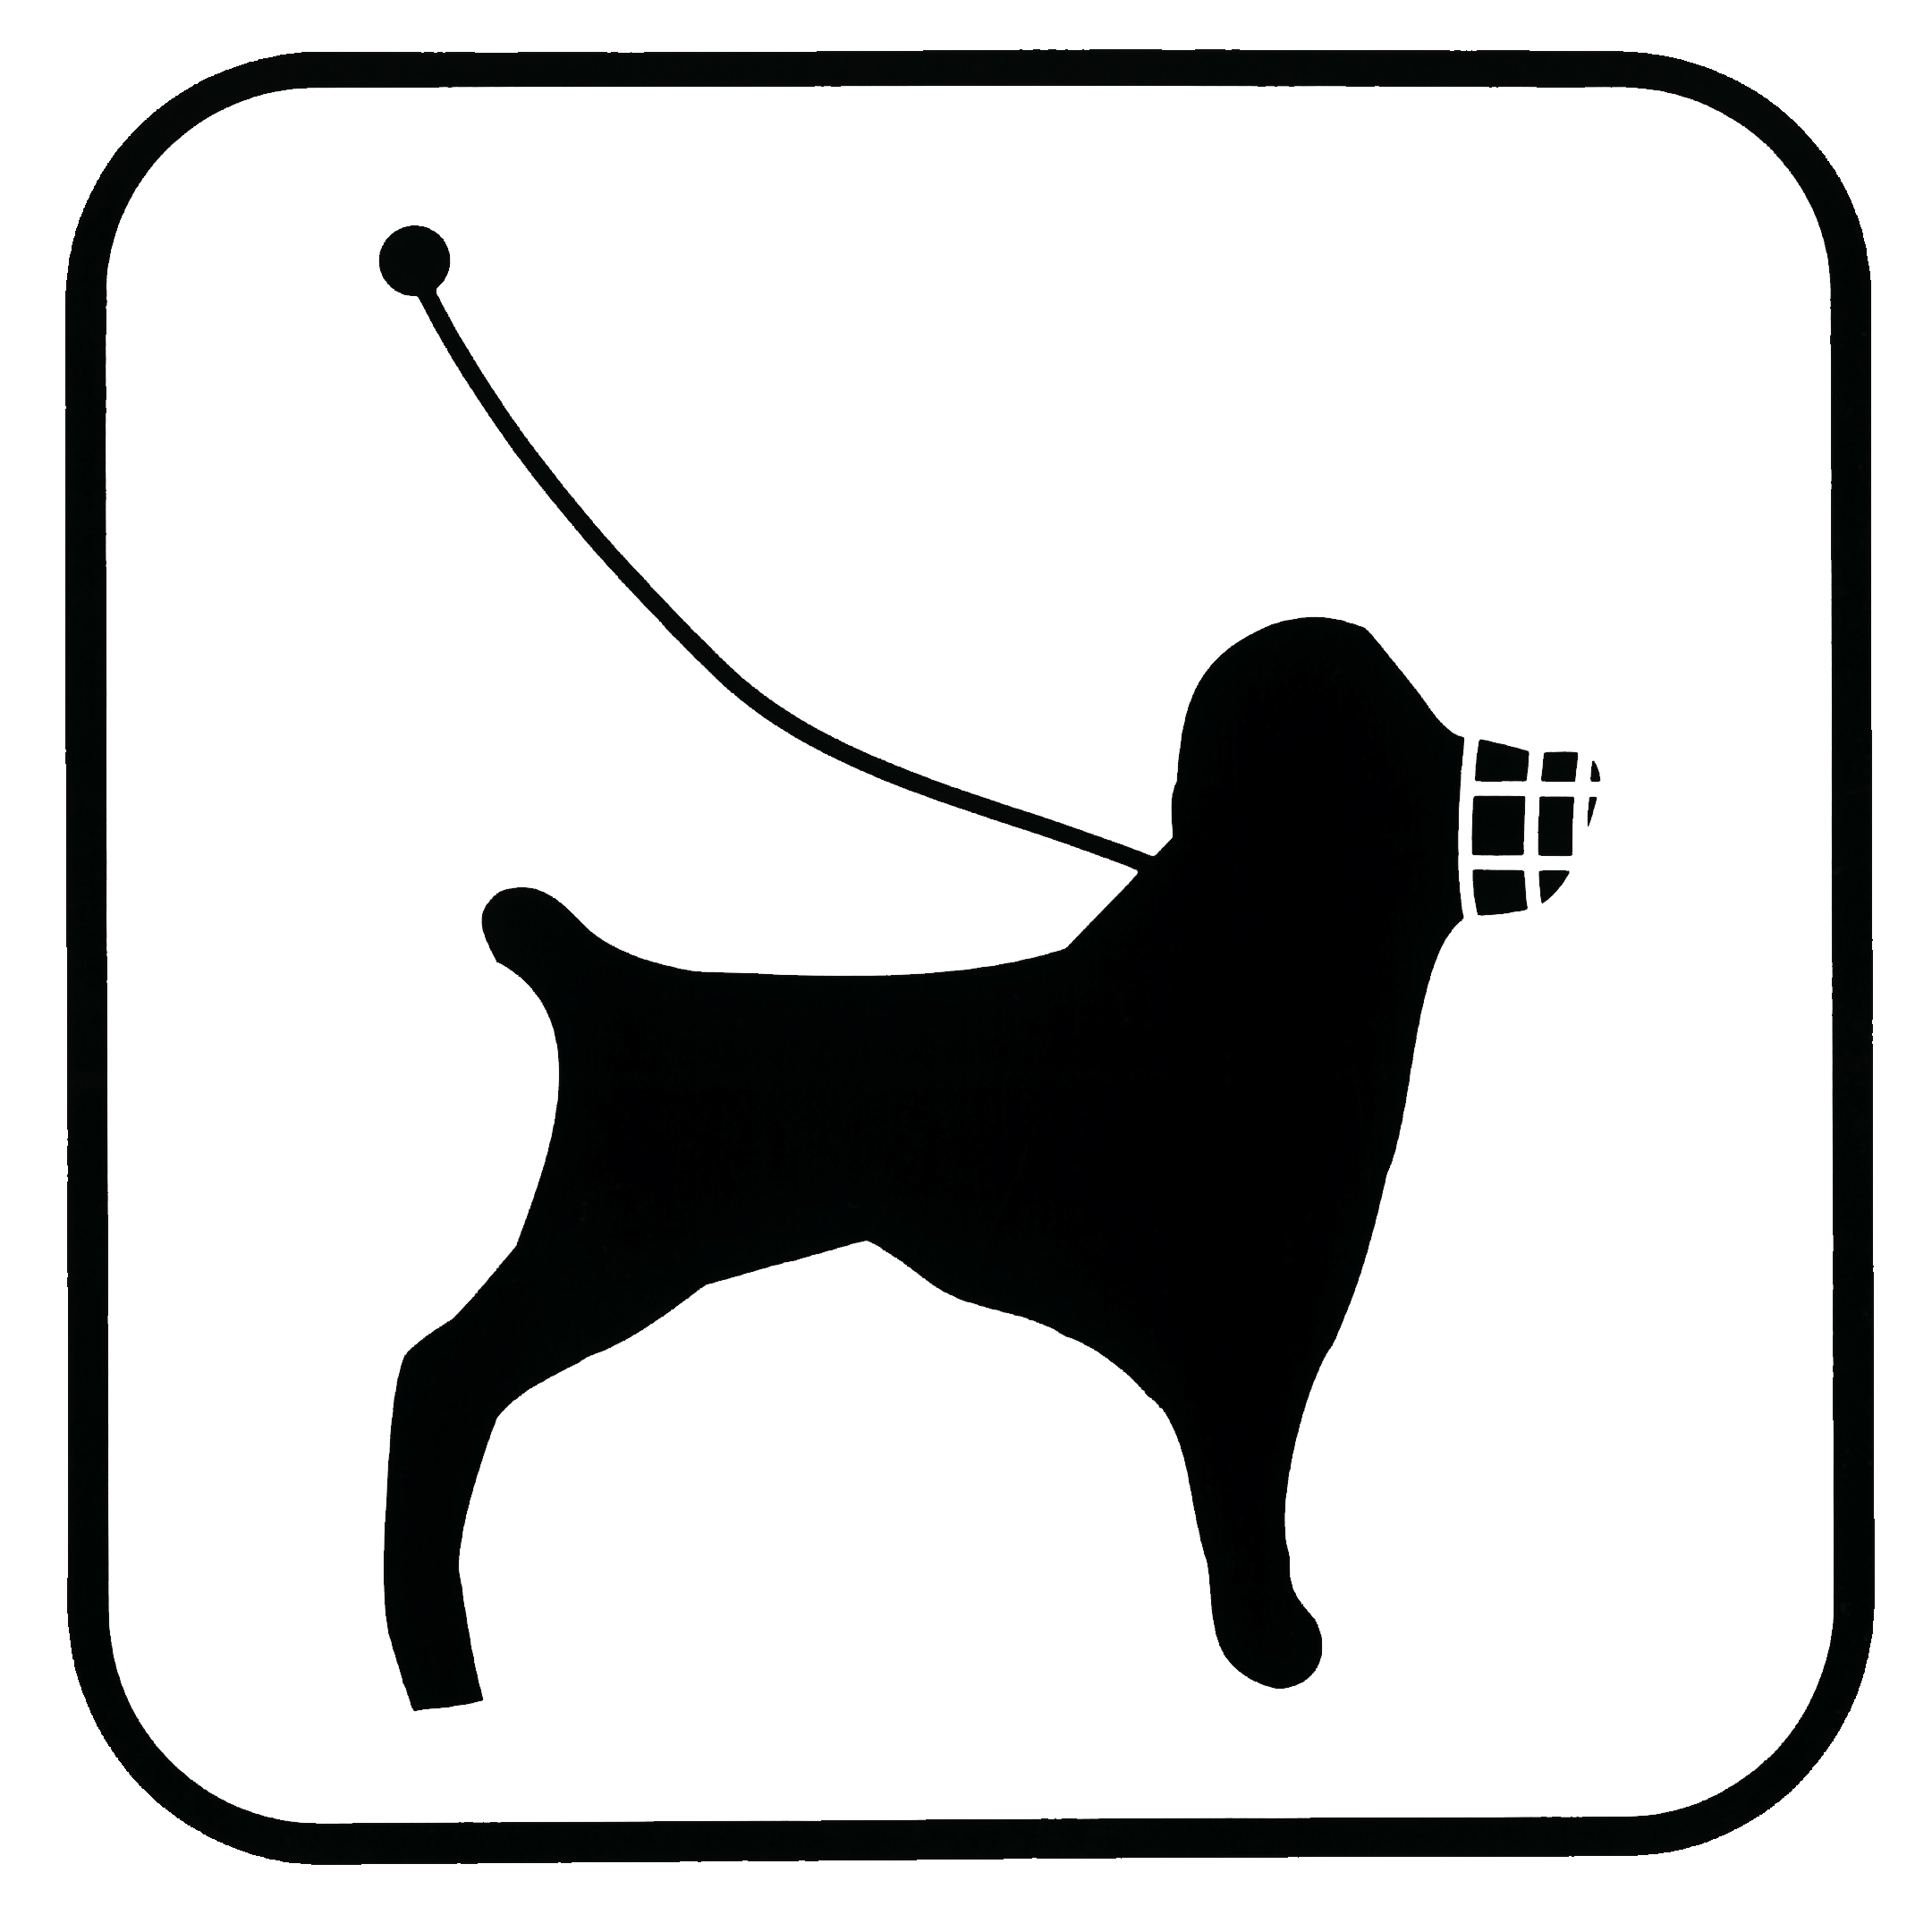 Piktogramm V20395: Hund mit Maulkorb und Leine